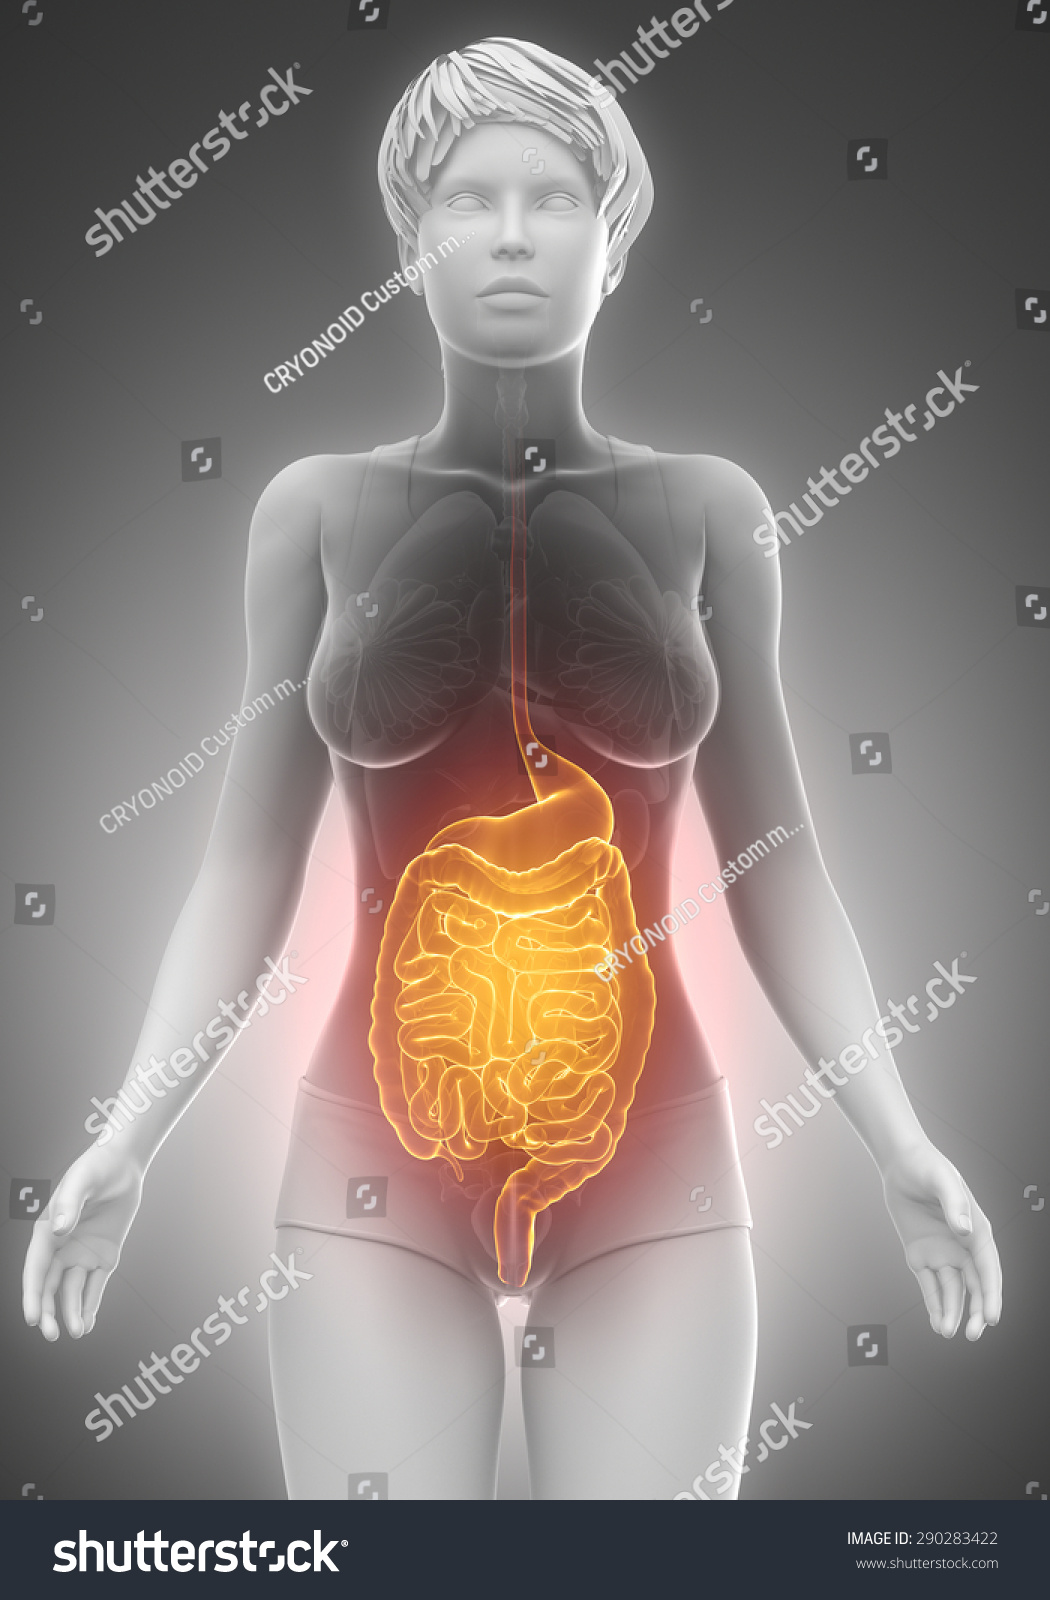 Female Guts Stomach Anatomy Xray Scan Stock Illustration 290283422 ...